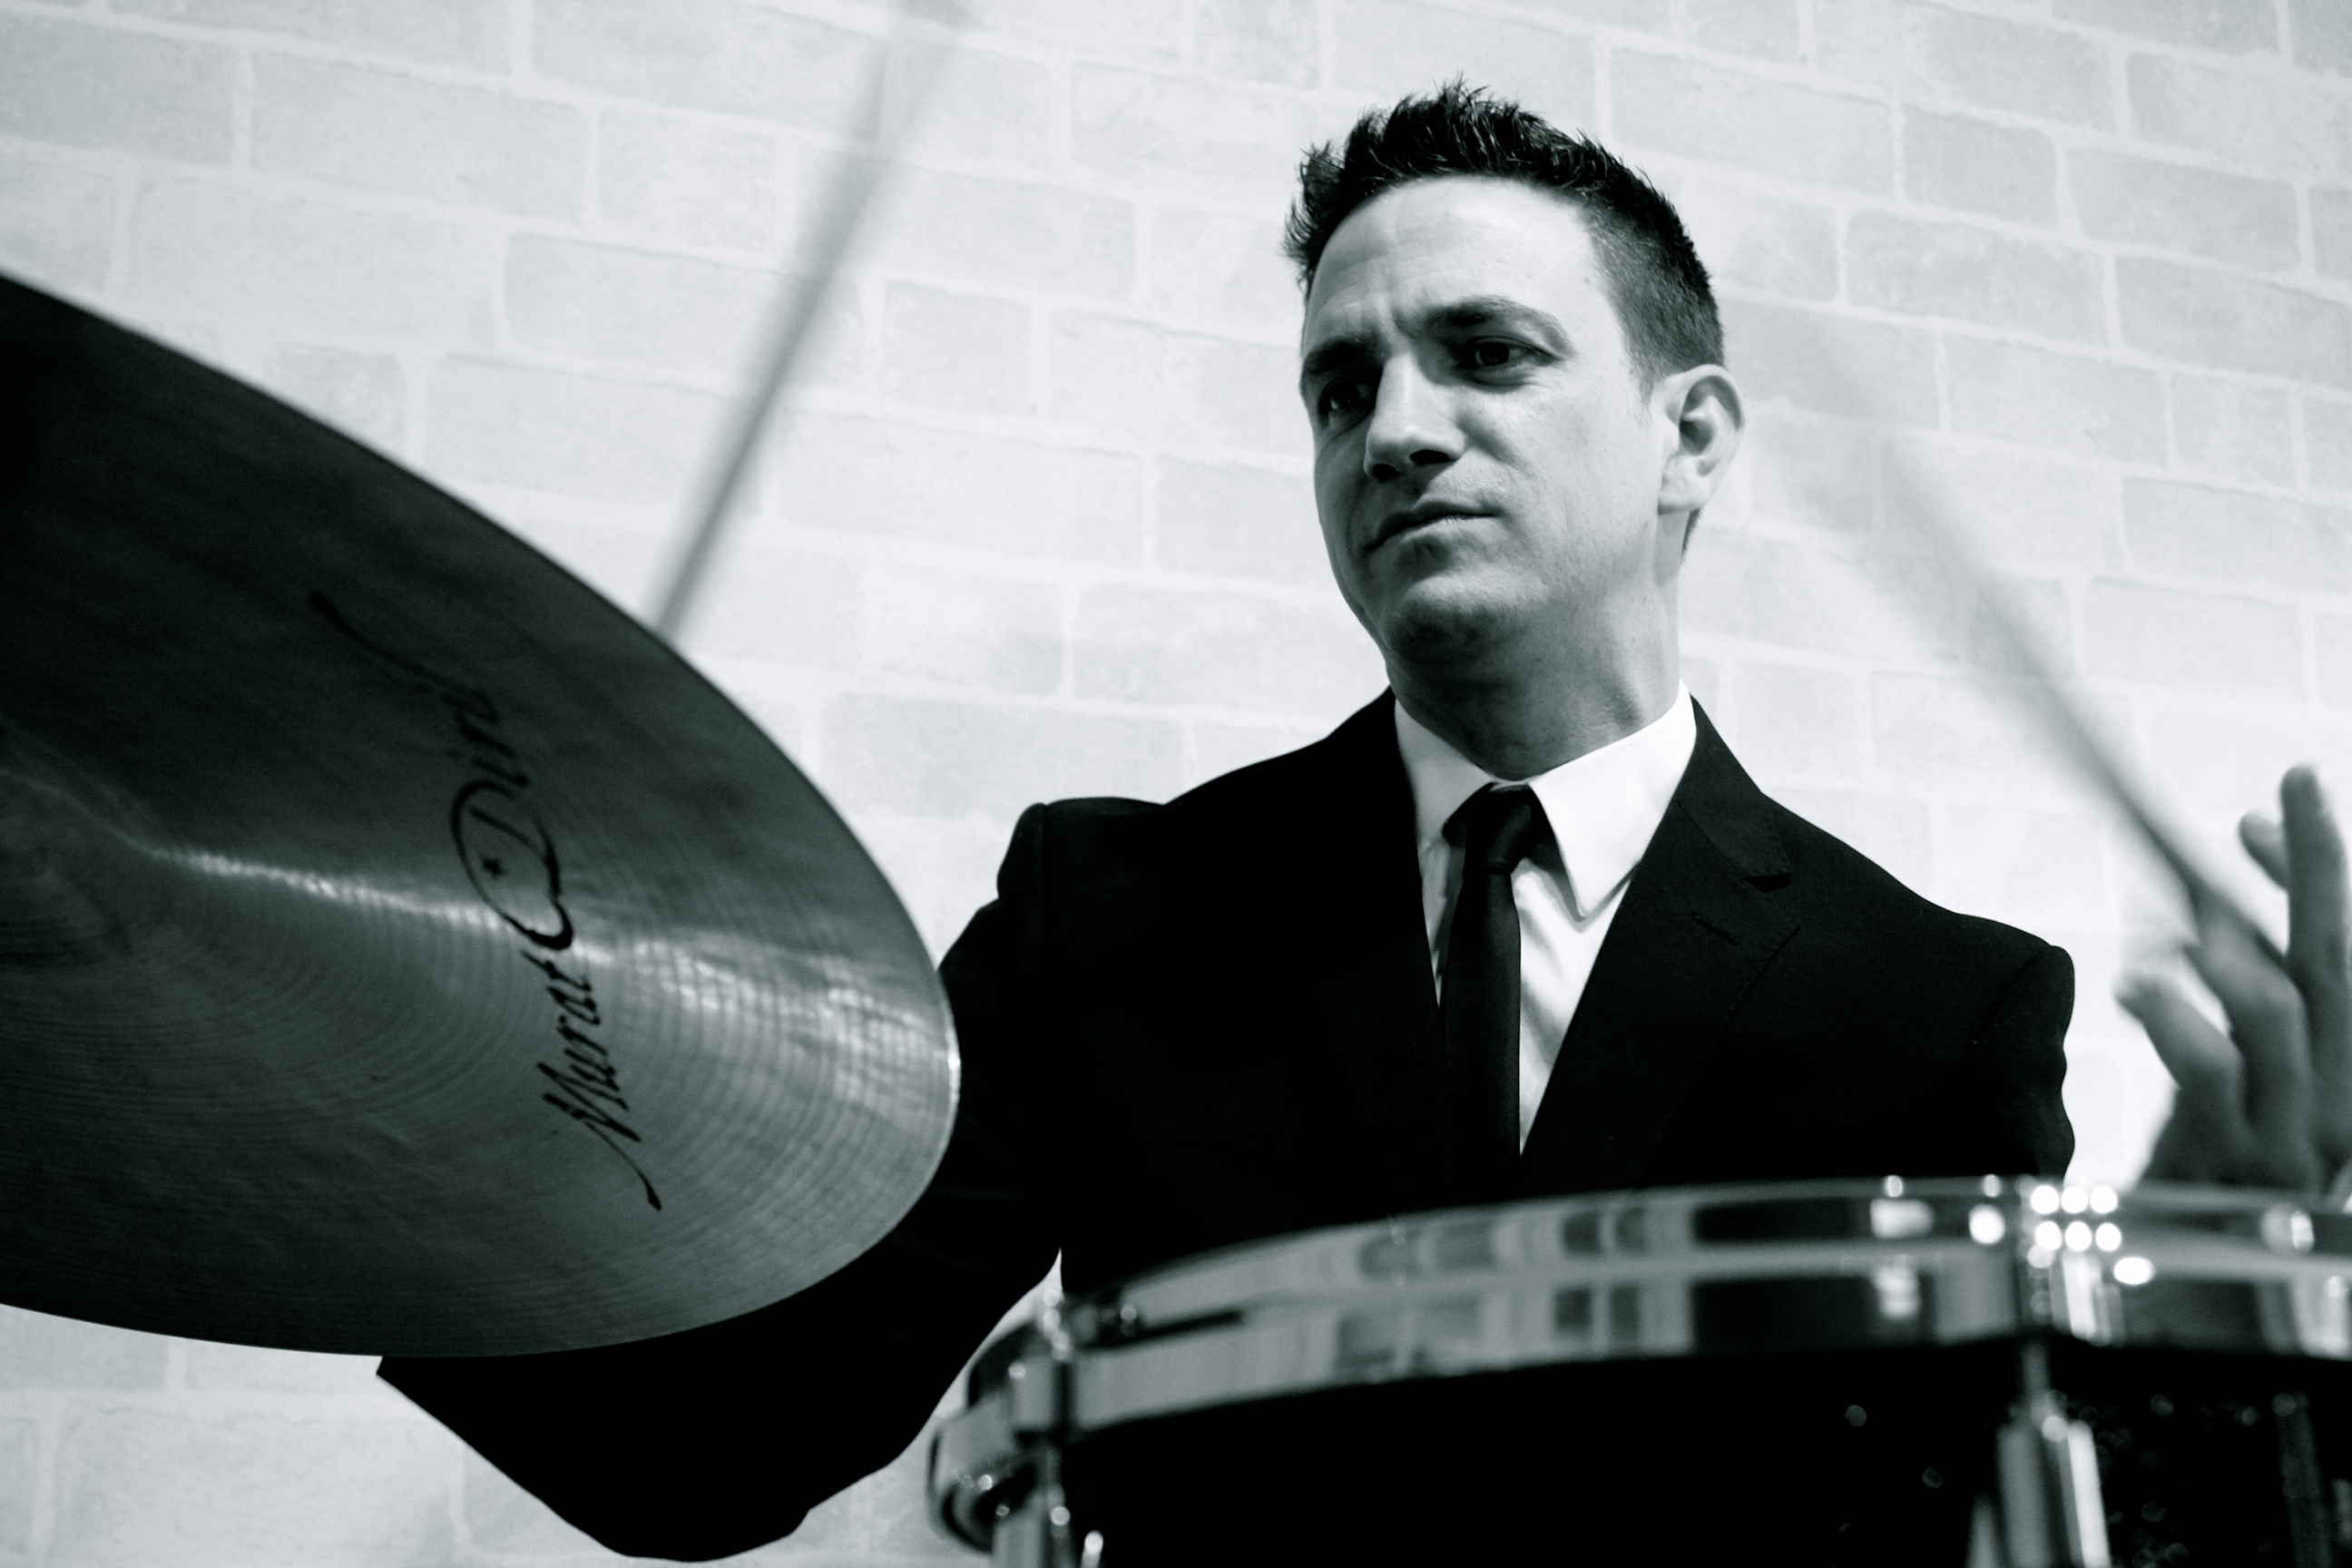 James Turner - AirGigs.com